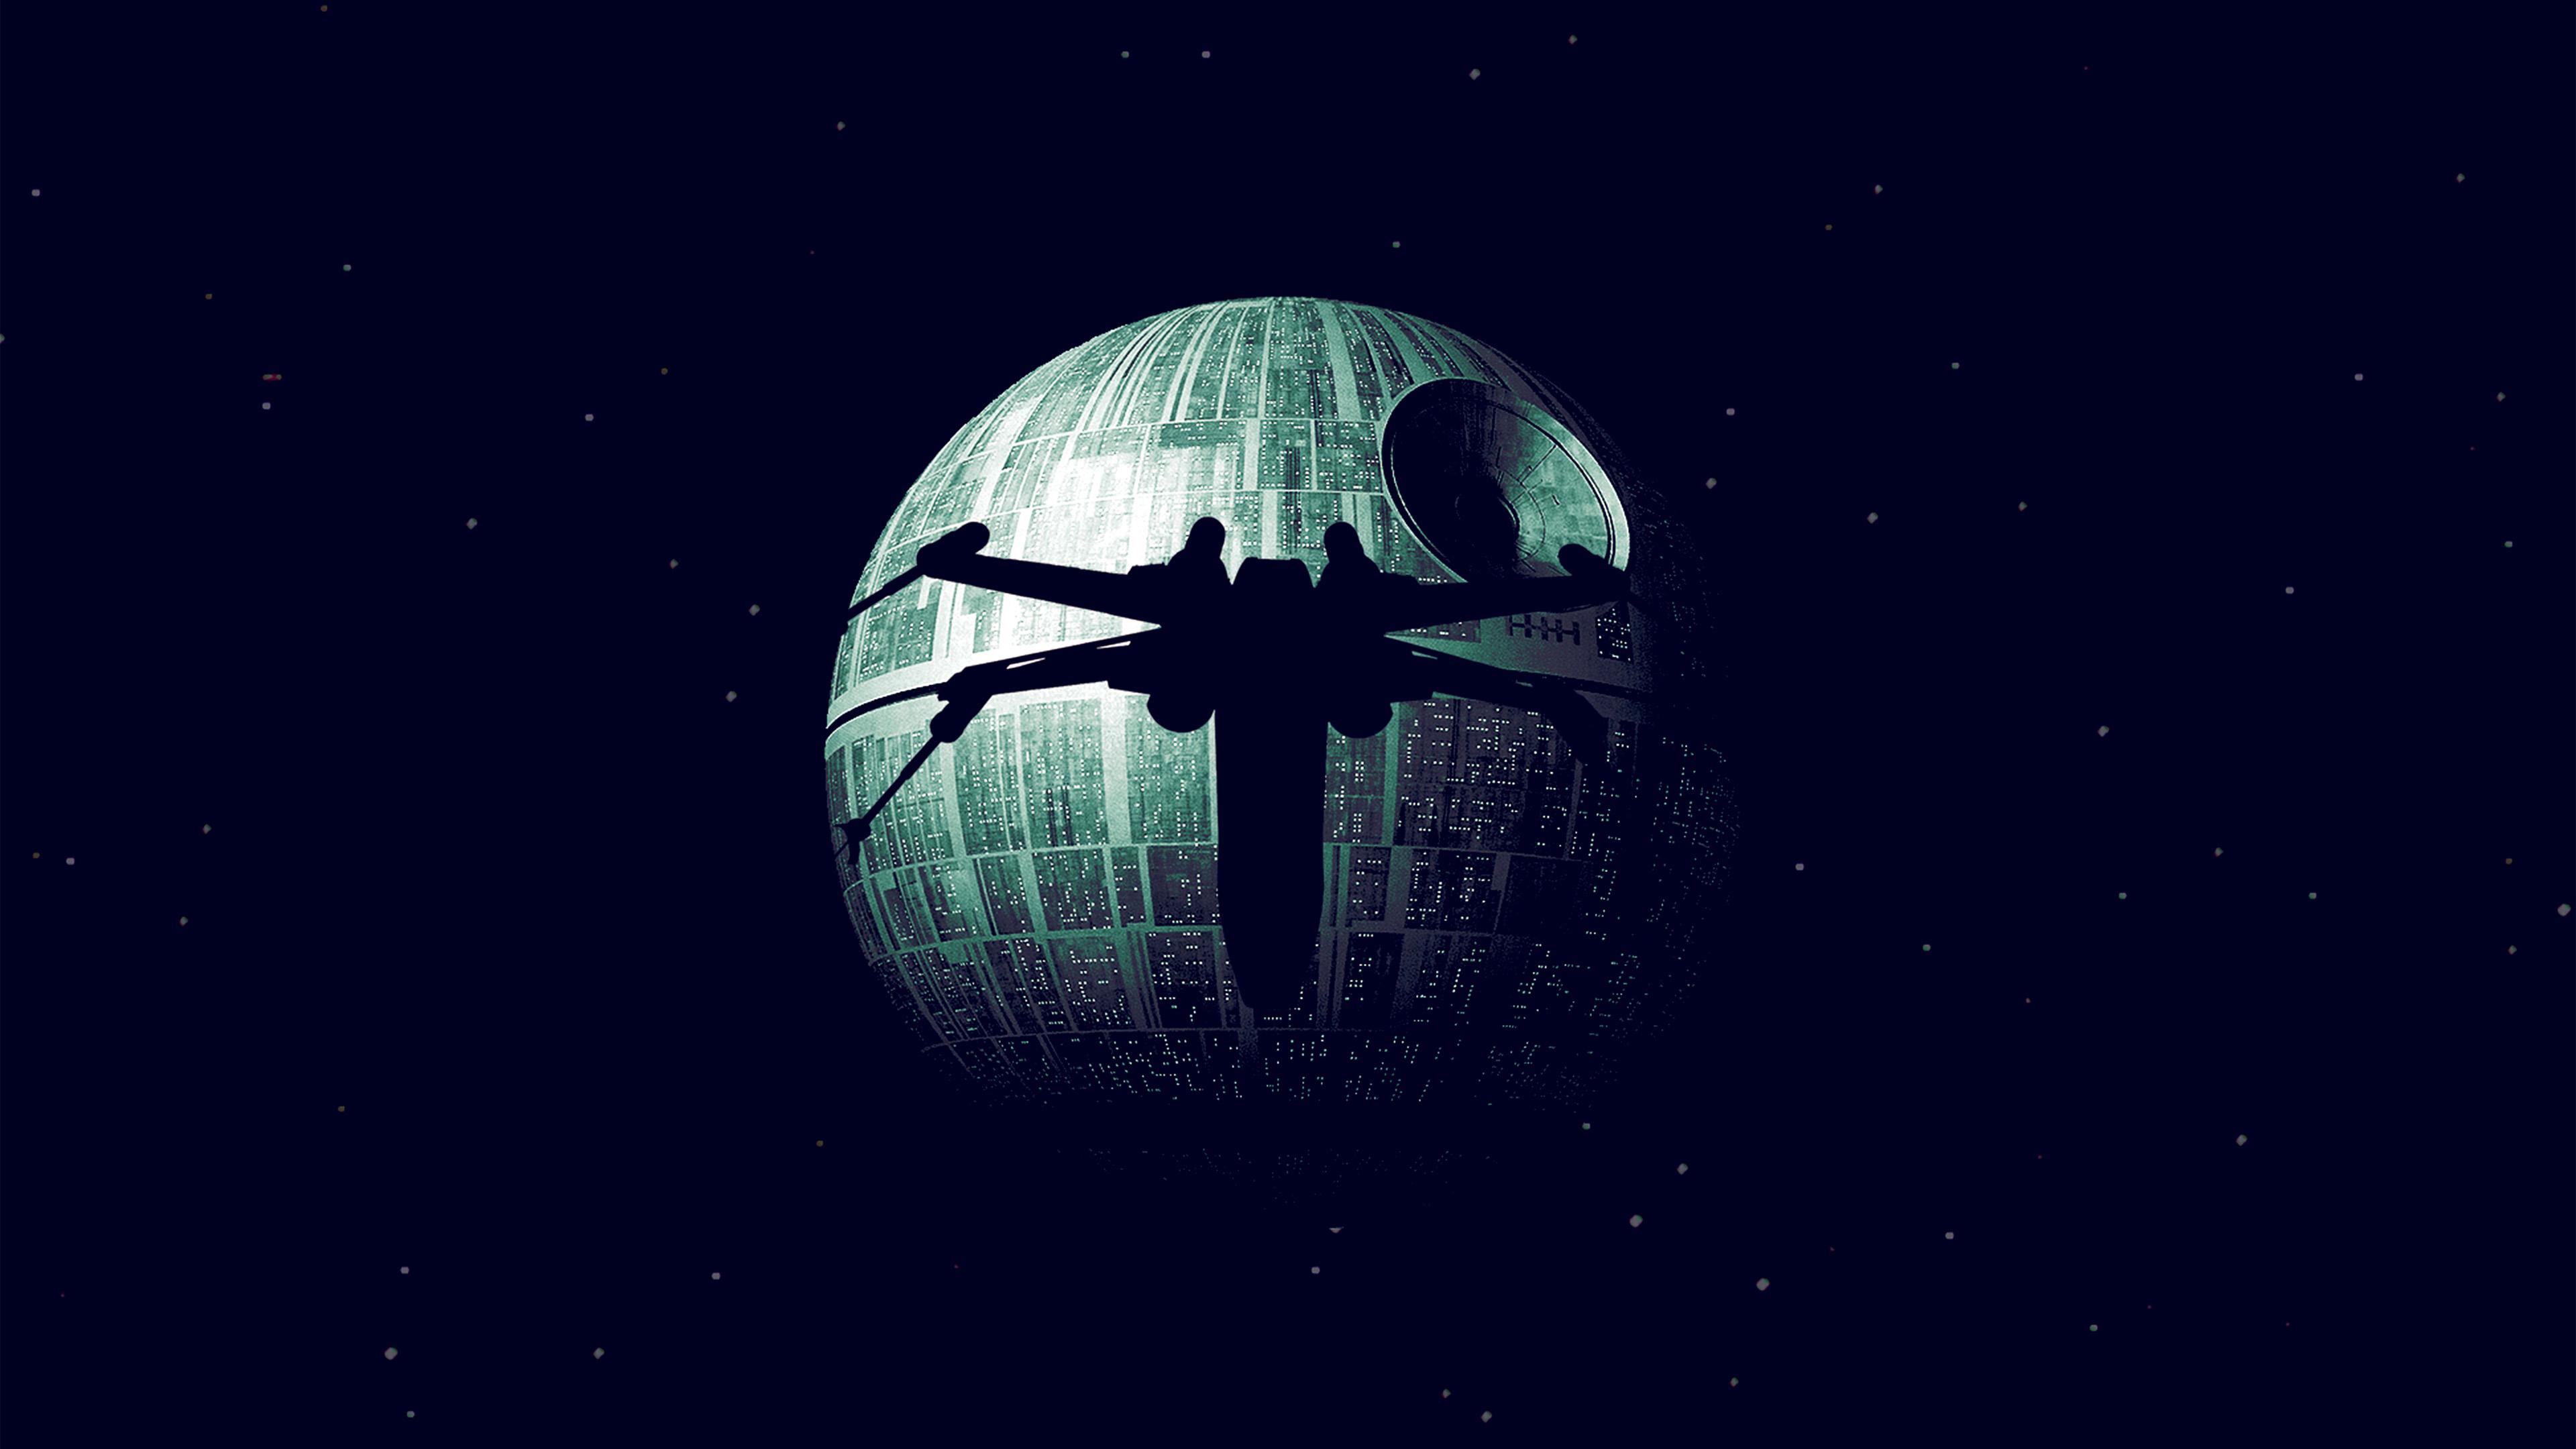 Ax07 Rogue One Dark Space Starwars Poster Illustration Art Blue Wallpaper